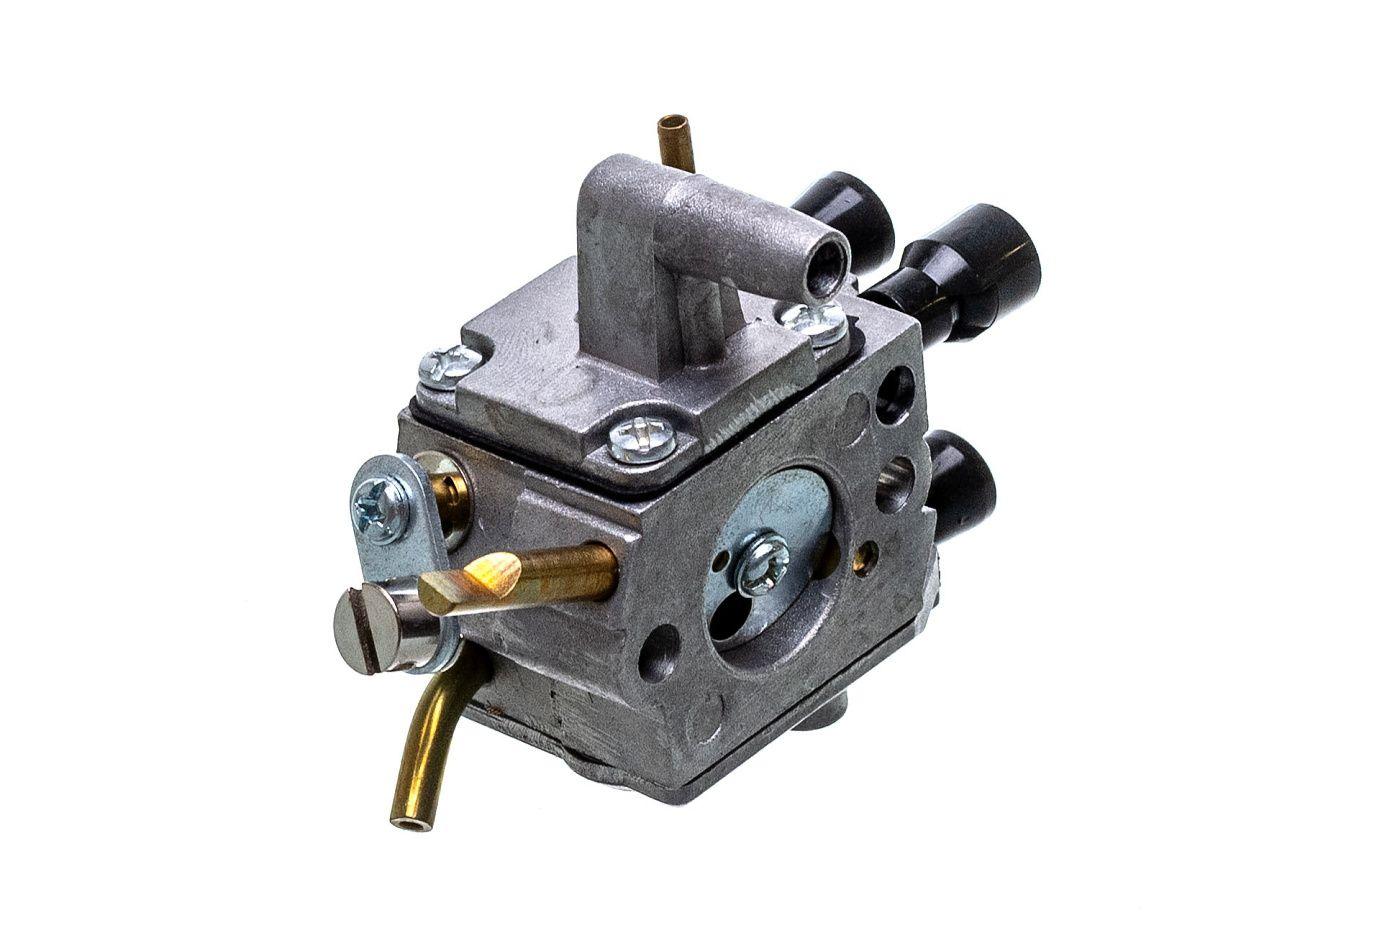 Karburátor Stihl FS120 BT120 BT121 FS200 FS250 FS300 FS350 C1Q-S161B (4134 120 0652)